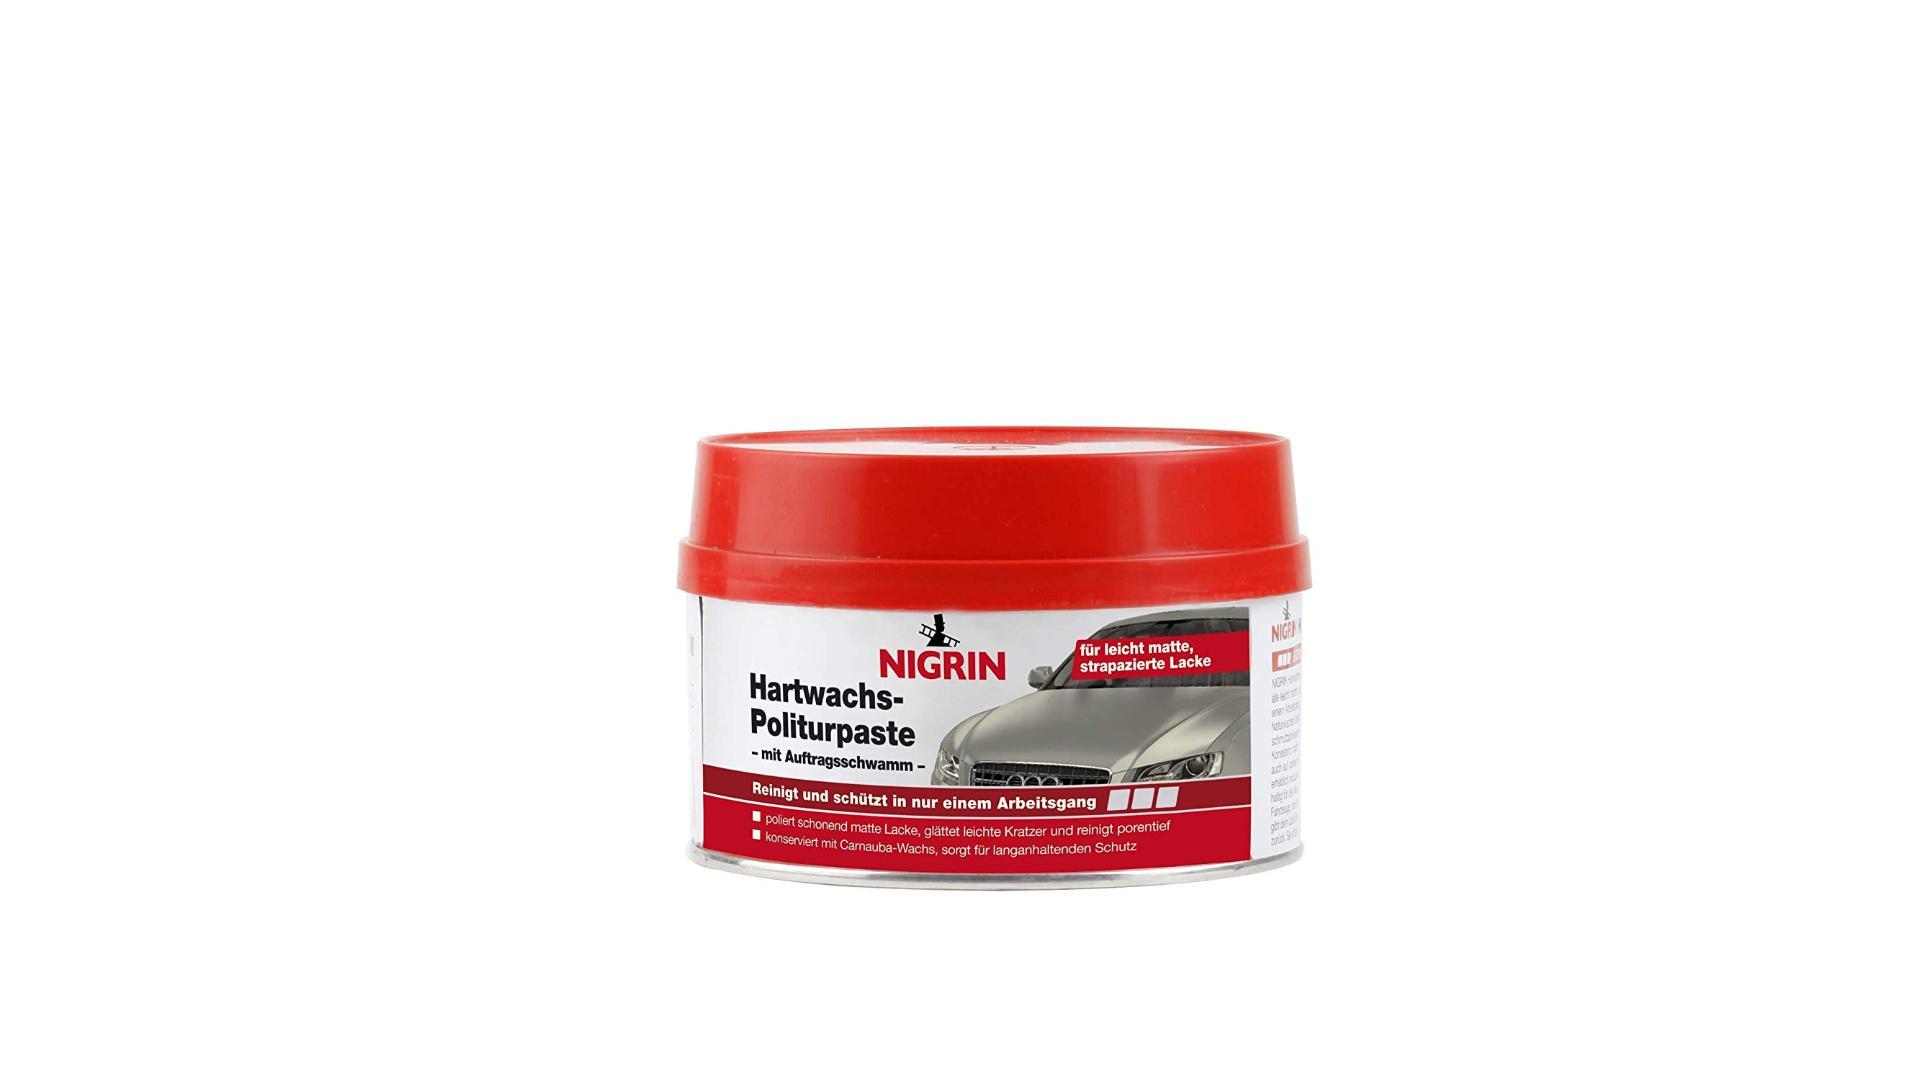 NIGRIN Hard wax - polishing paste 250ml